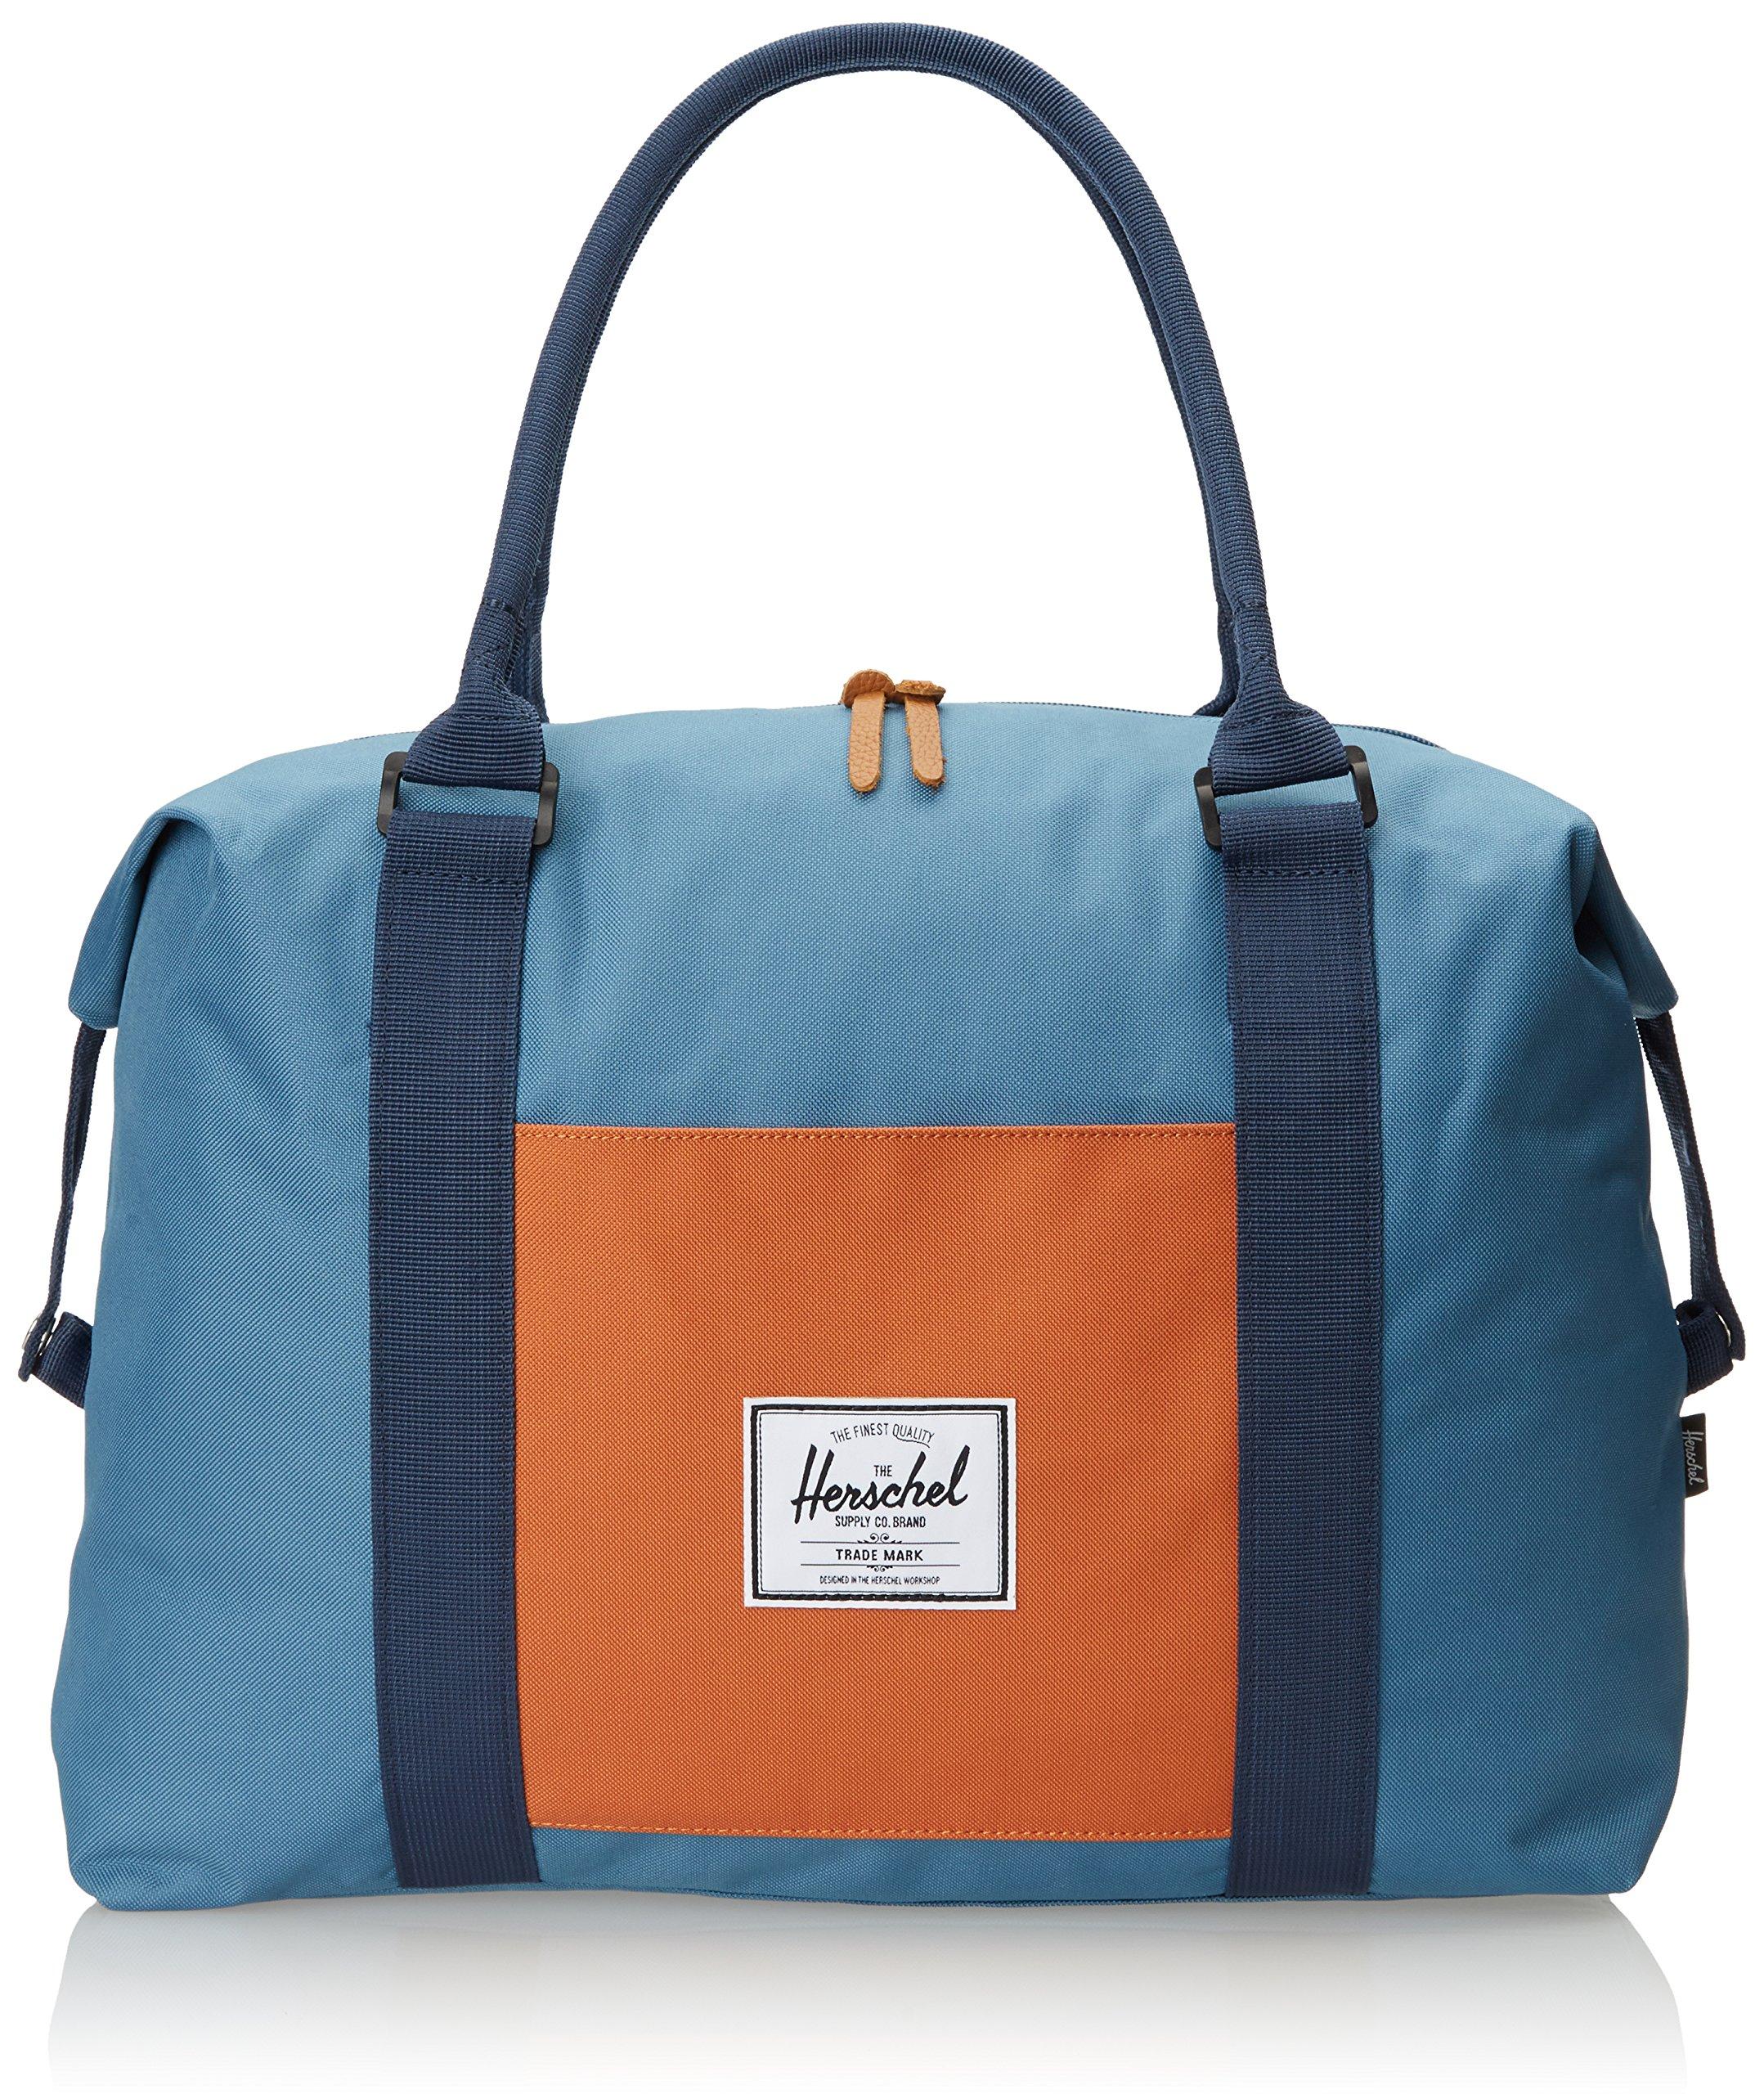 Herschel Supply Co. Strand, Cadet Blue/Carrot/Navy, One Size